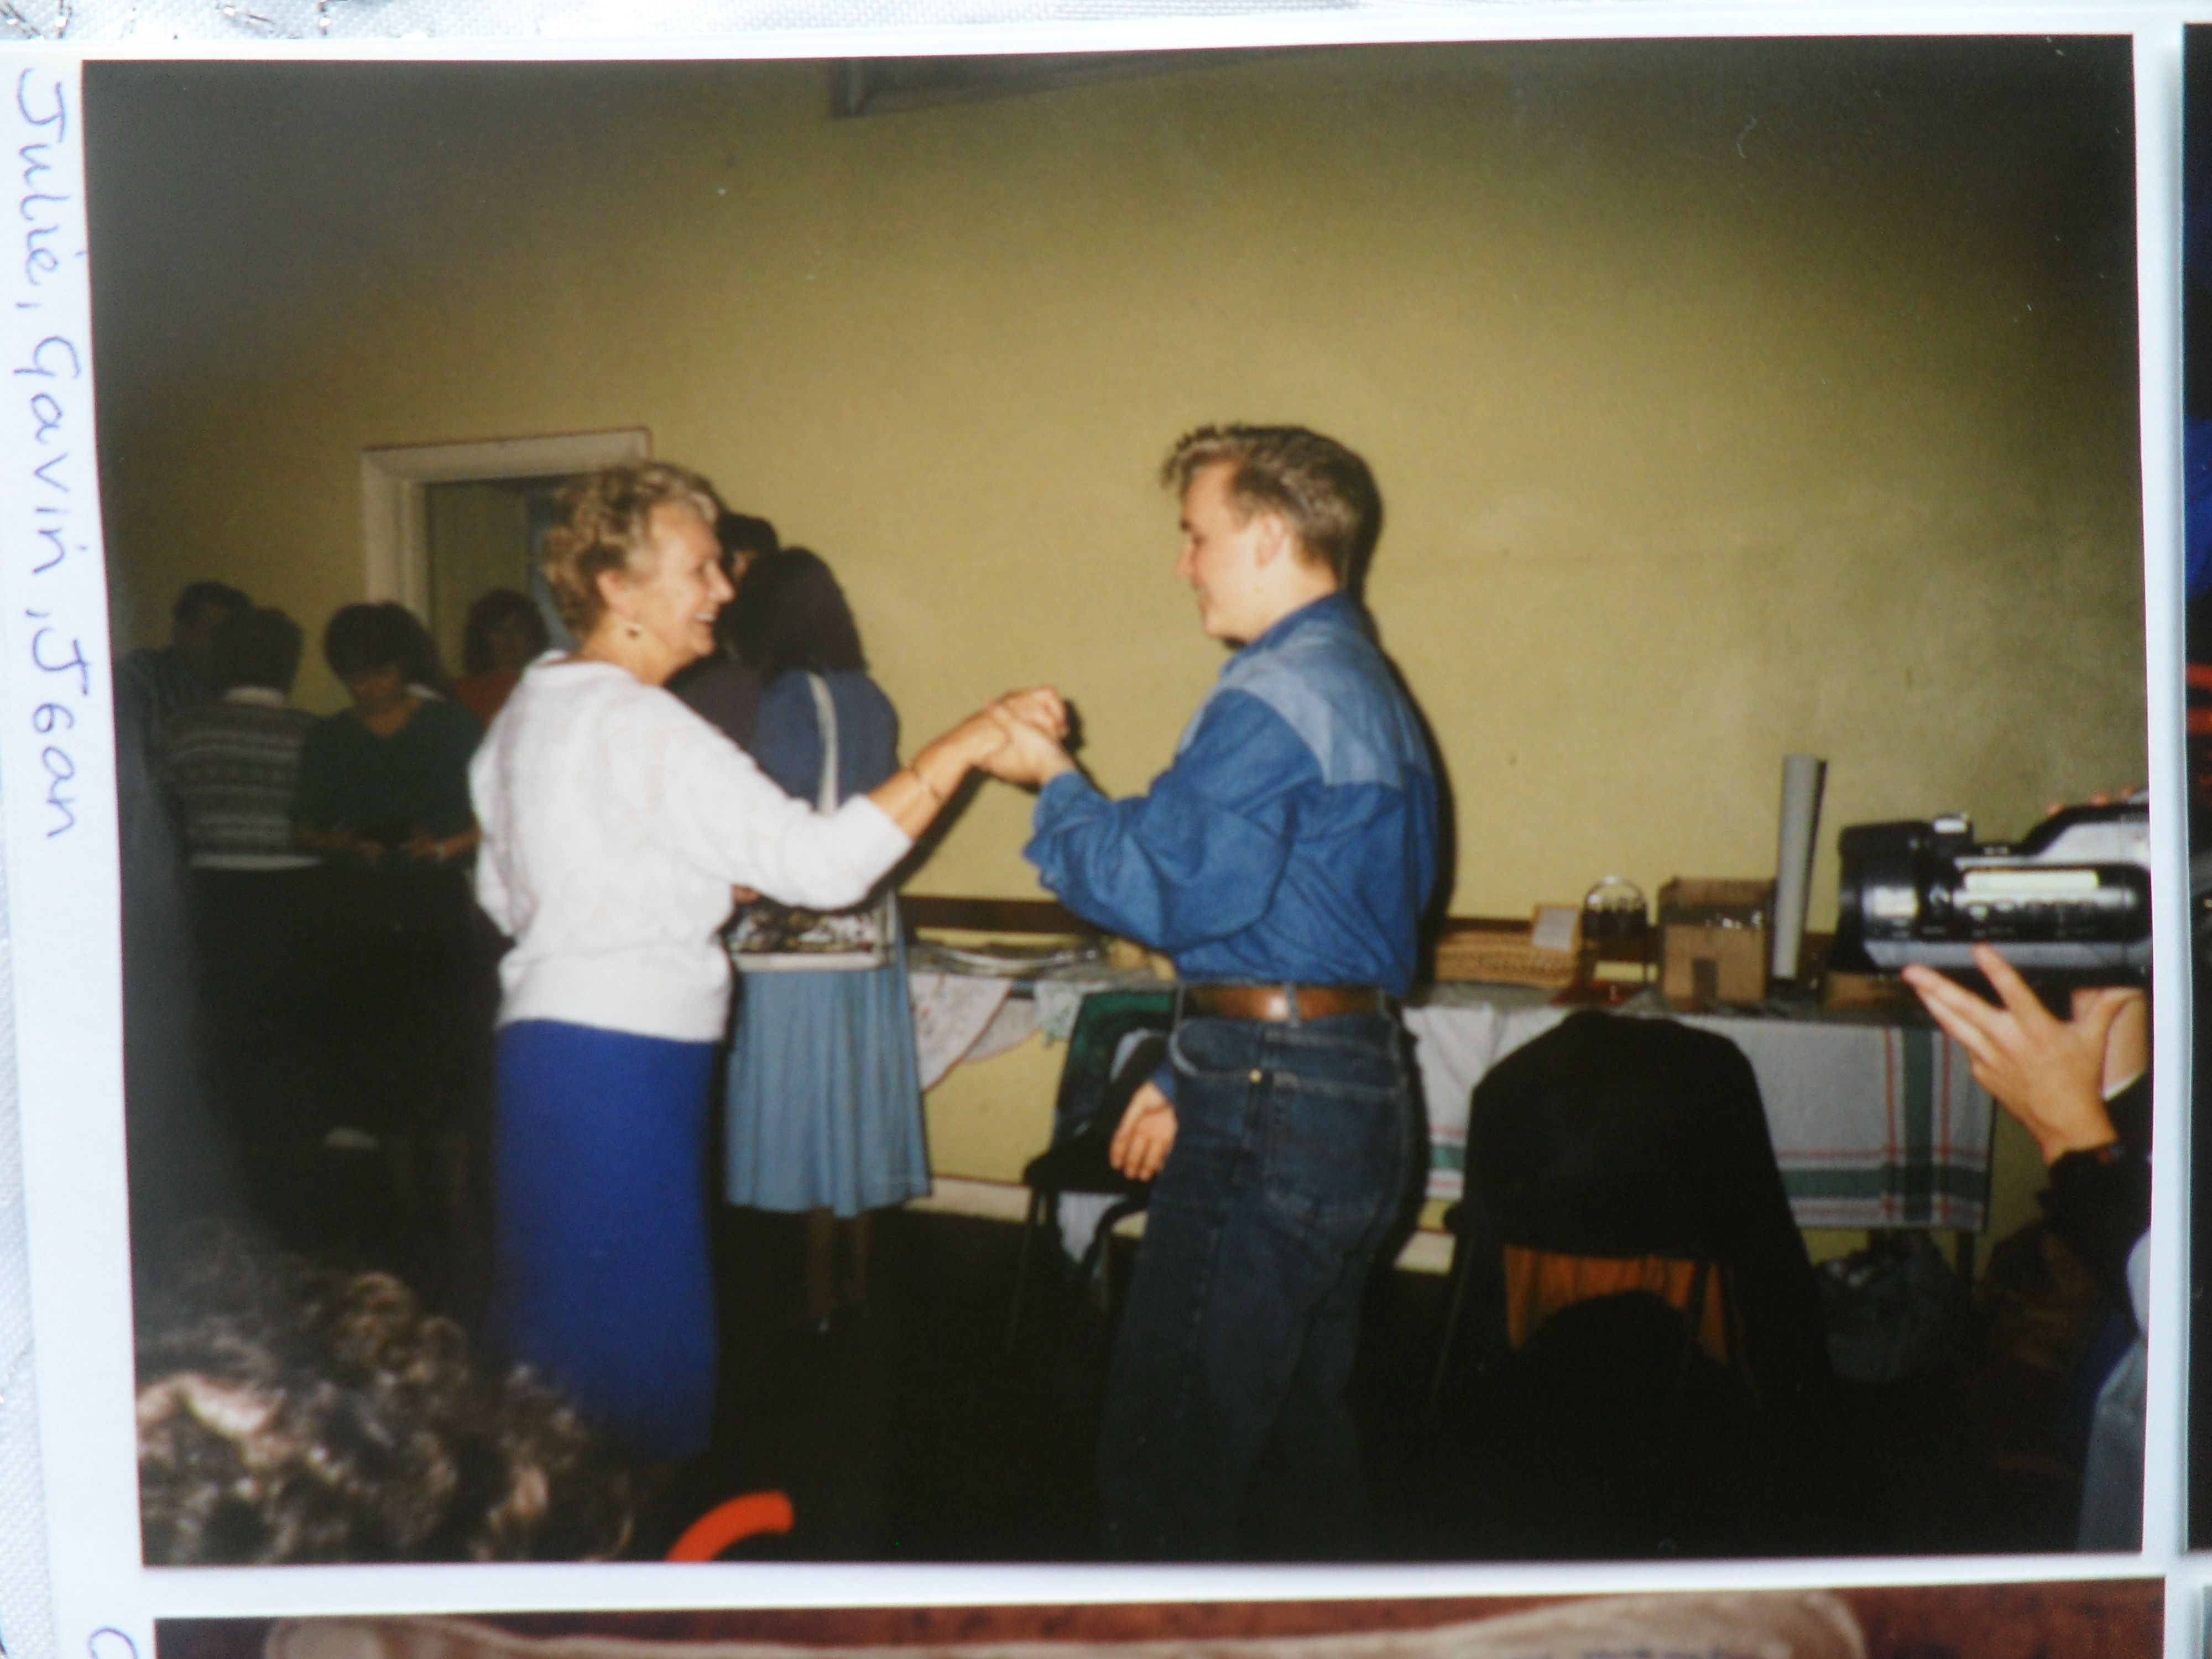 Billy's Mum, Jean Wycherley dancing with Gavin Stanley (Billy Tribute Artist) -  around 1995?